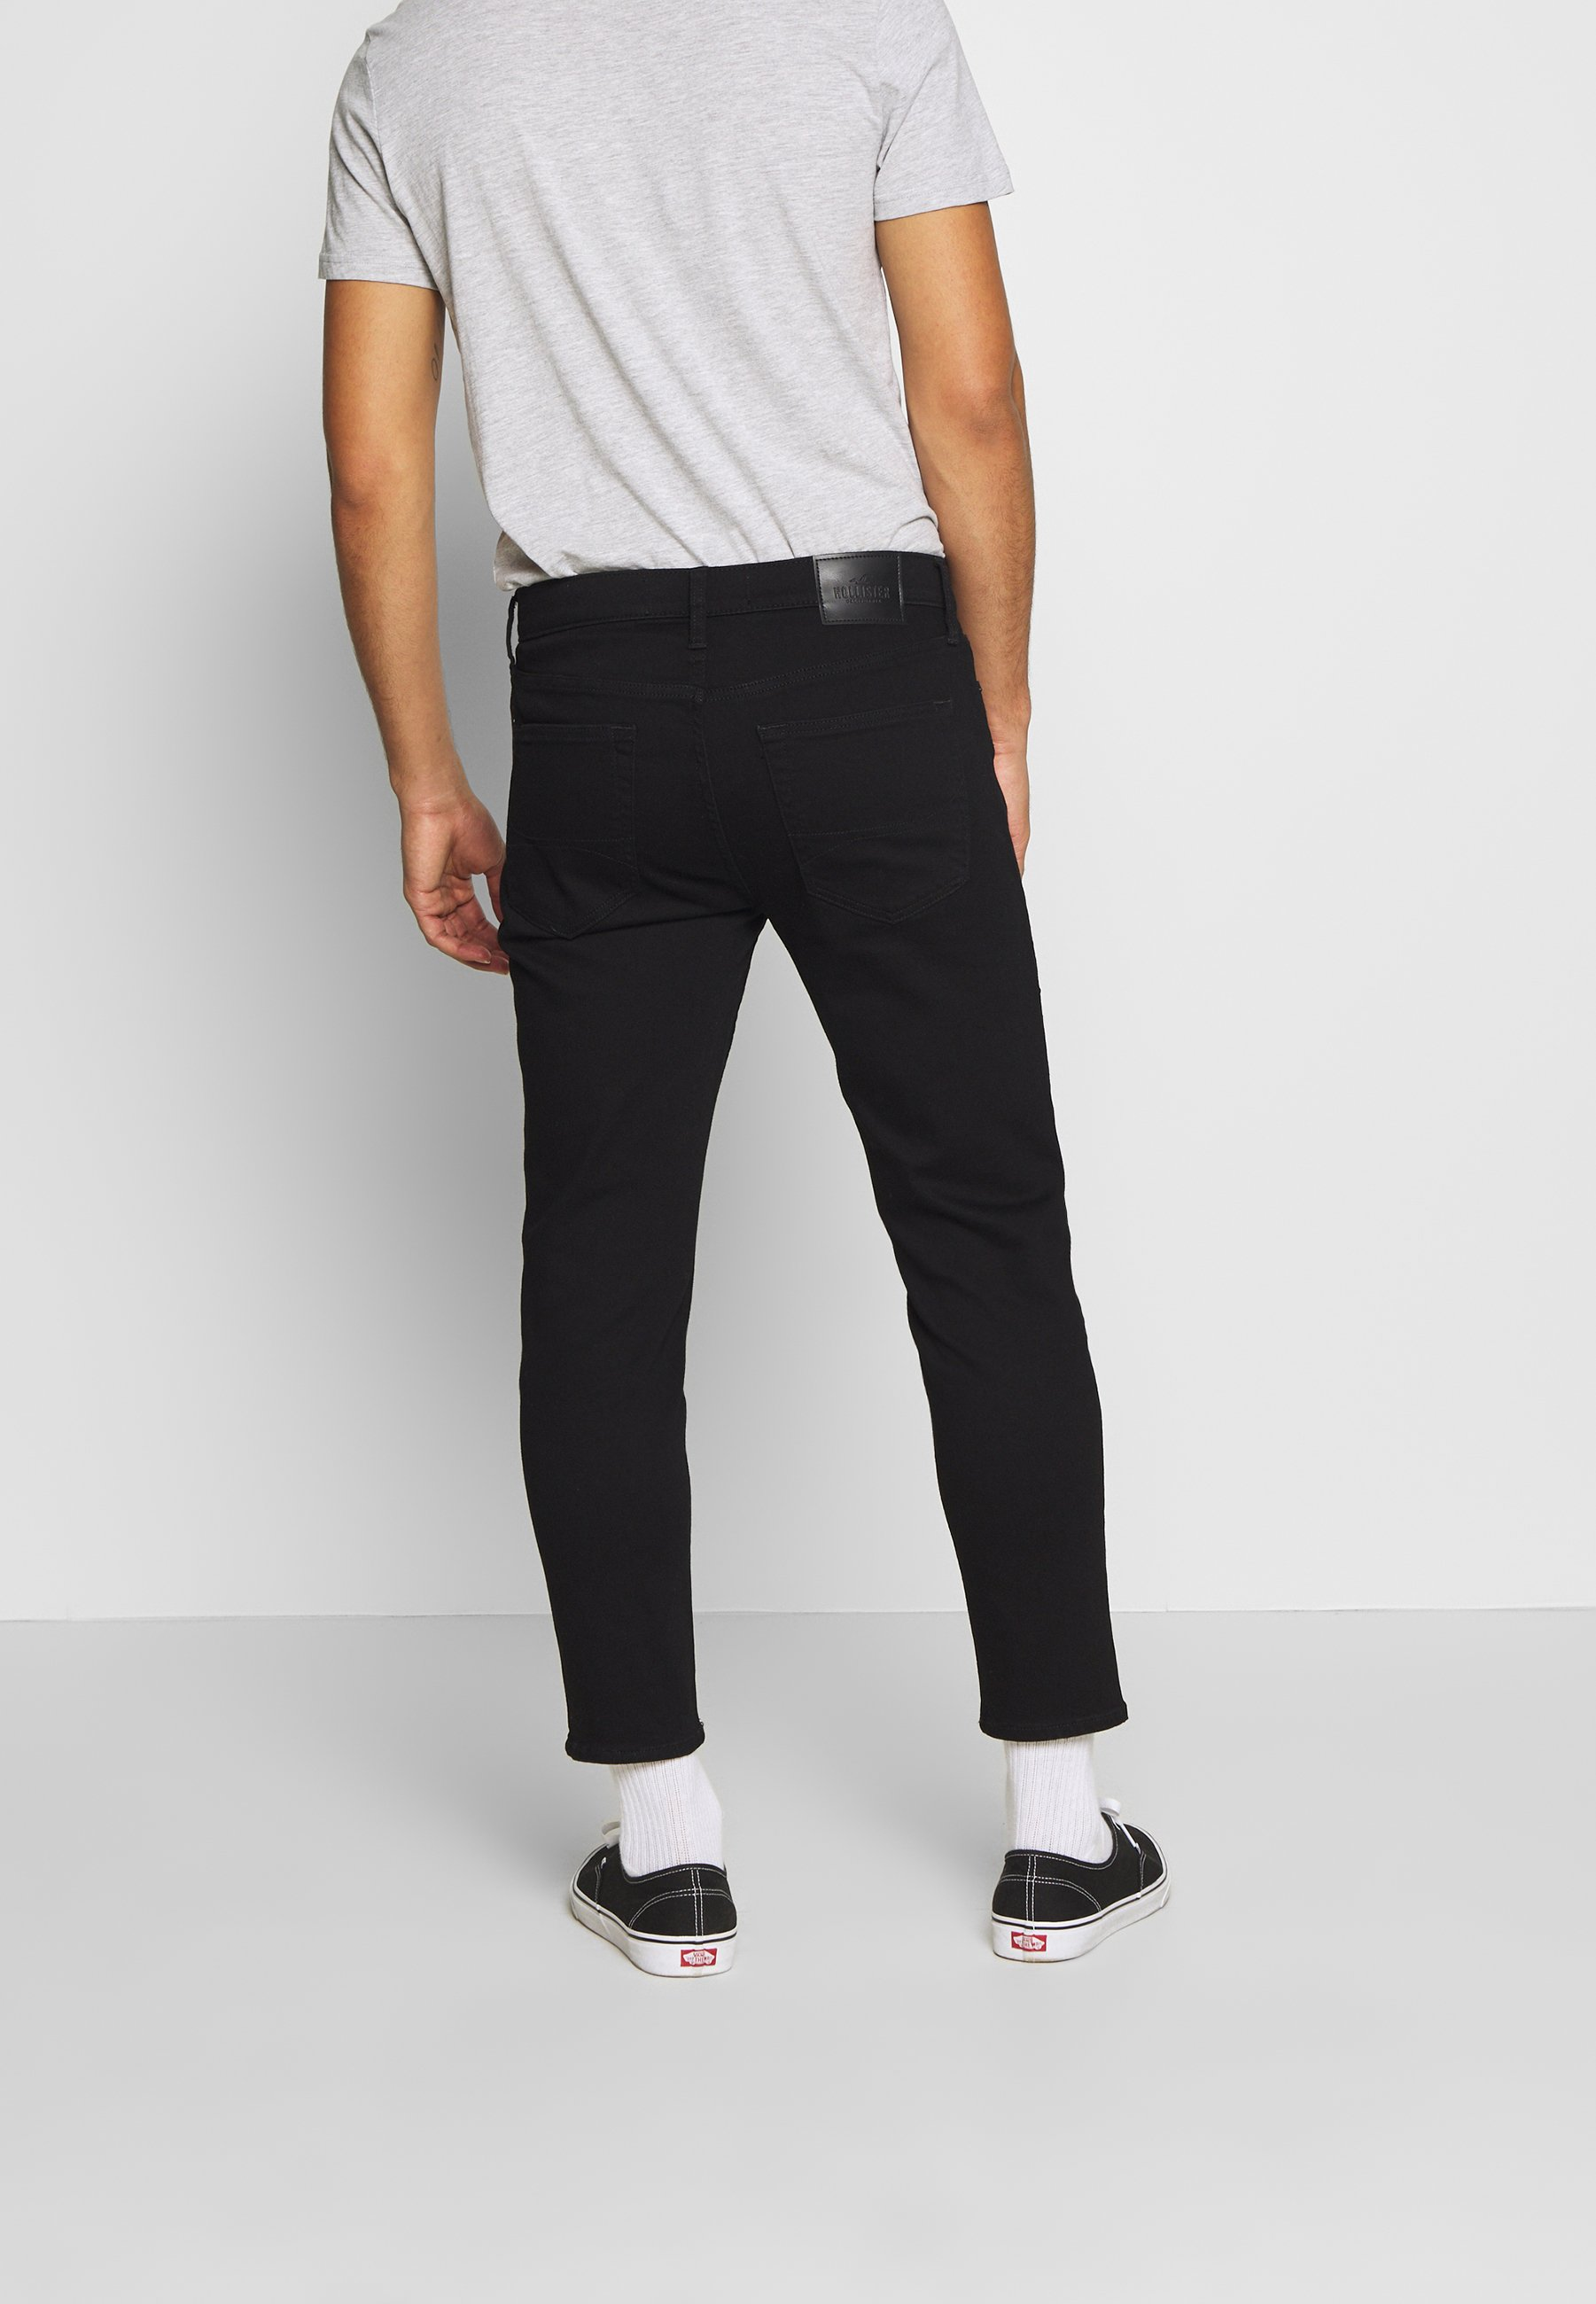 Hollister Co. TAPER CROP REPAIR - Jeans fuselé - black